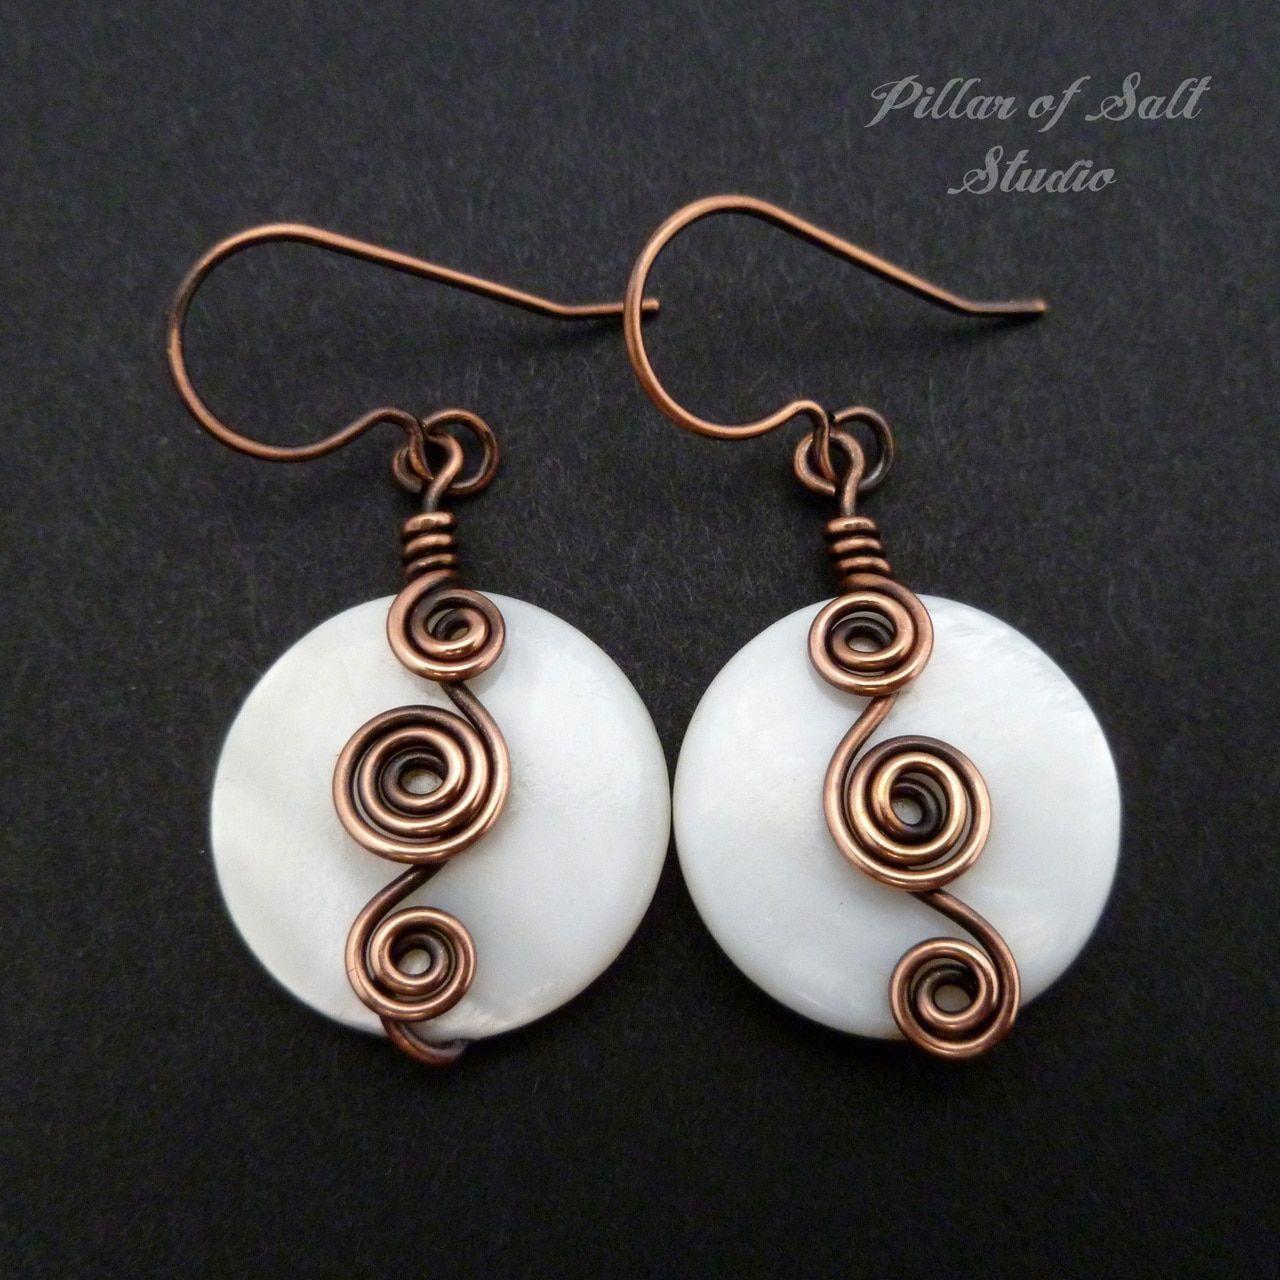 copper wire wrapped earrings jewelry by Pillar of Salt Studio #wirejewelry #diyhomedecor